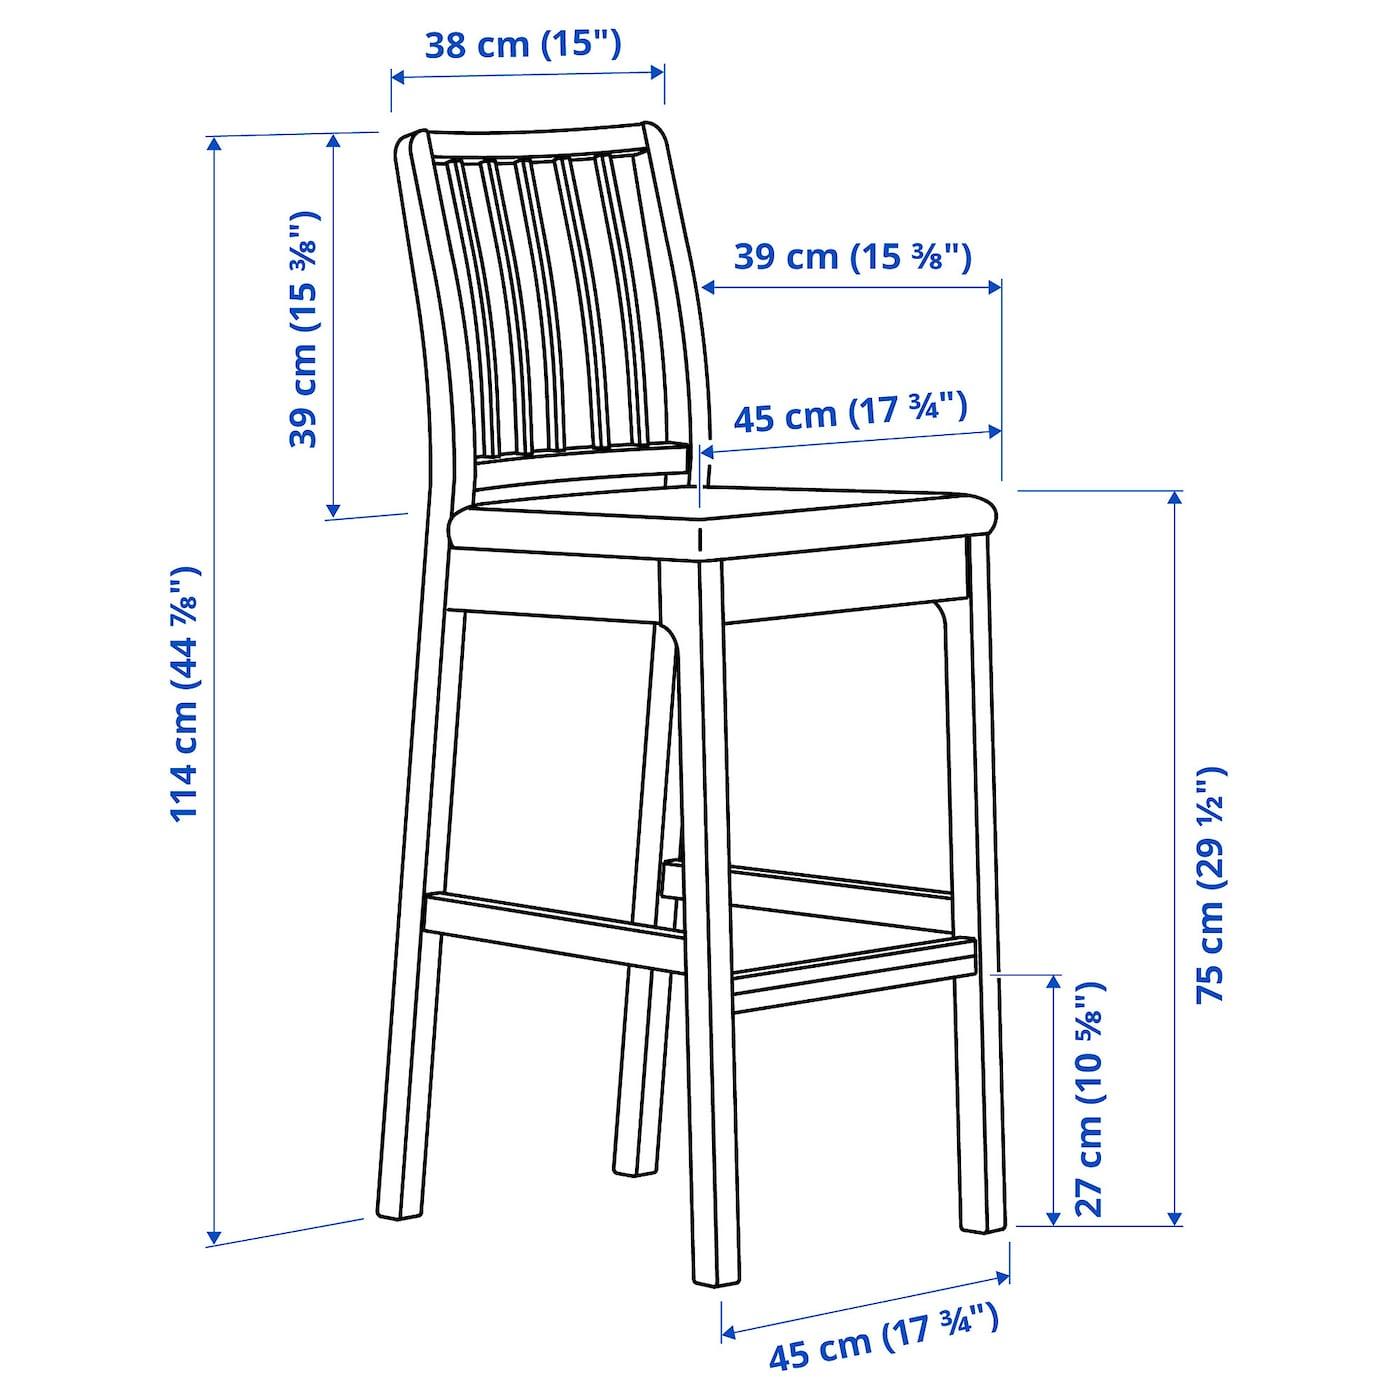 EKEDALEN Bar stool with backrest - white/Ramna light grey 5 cm